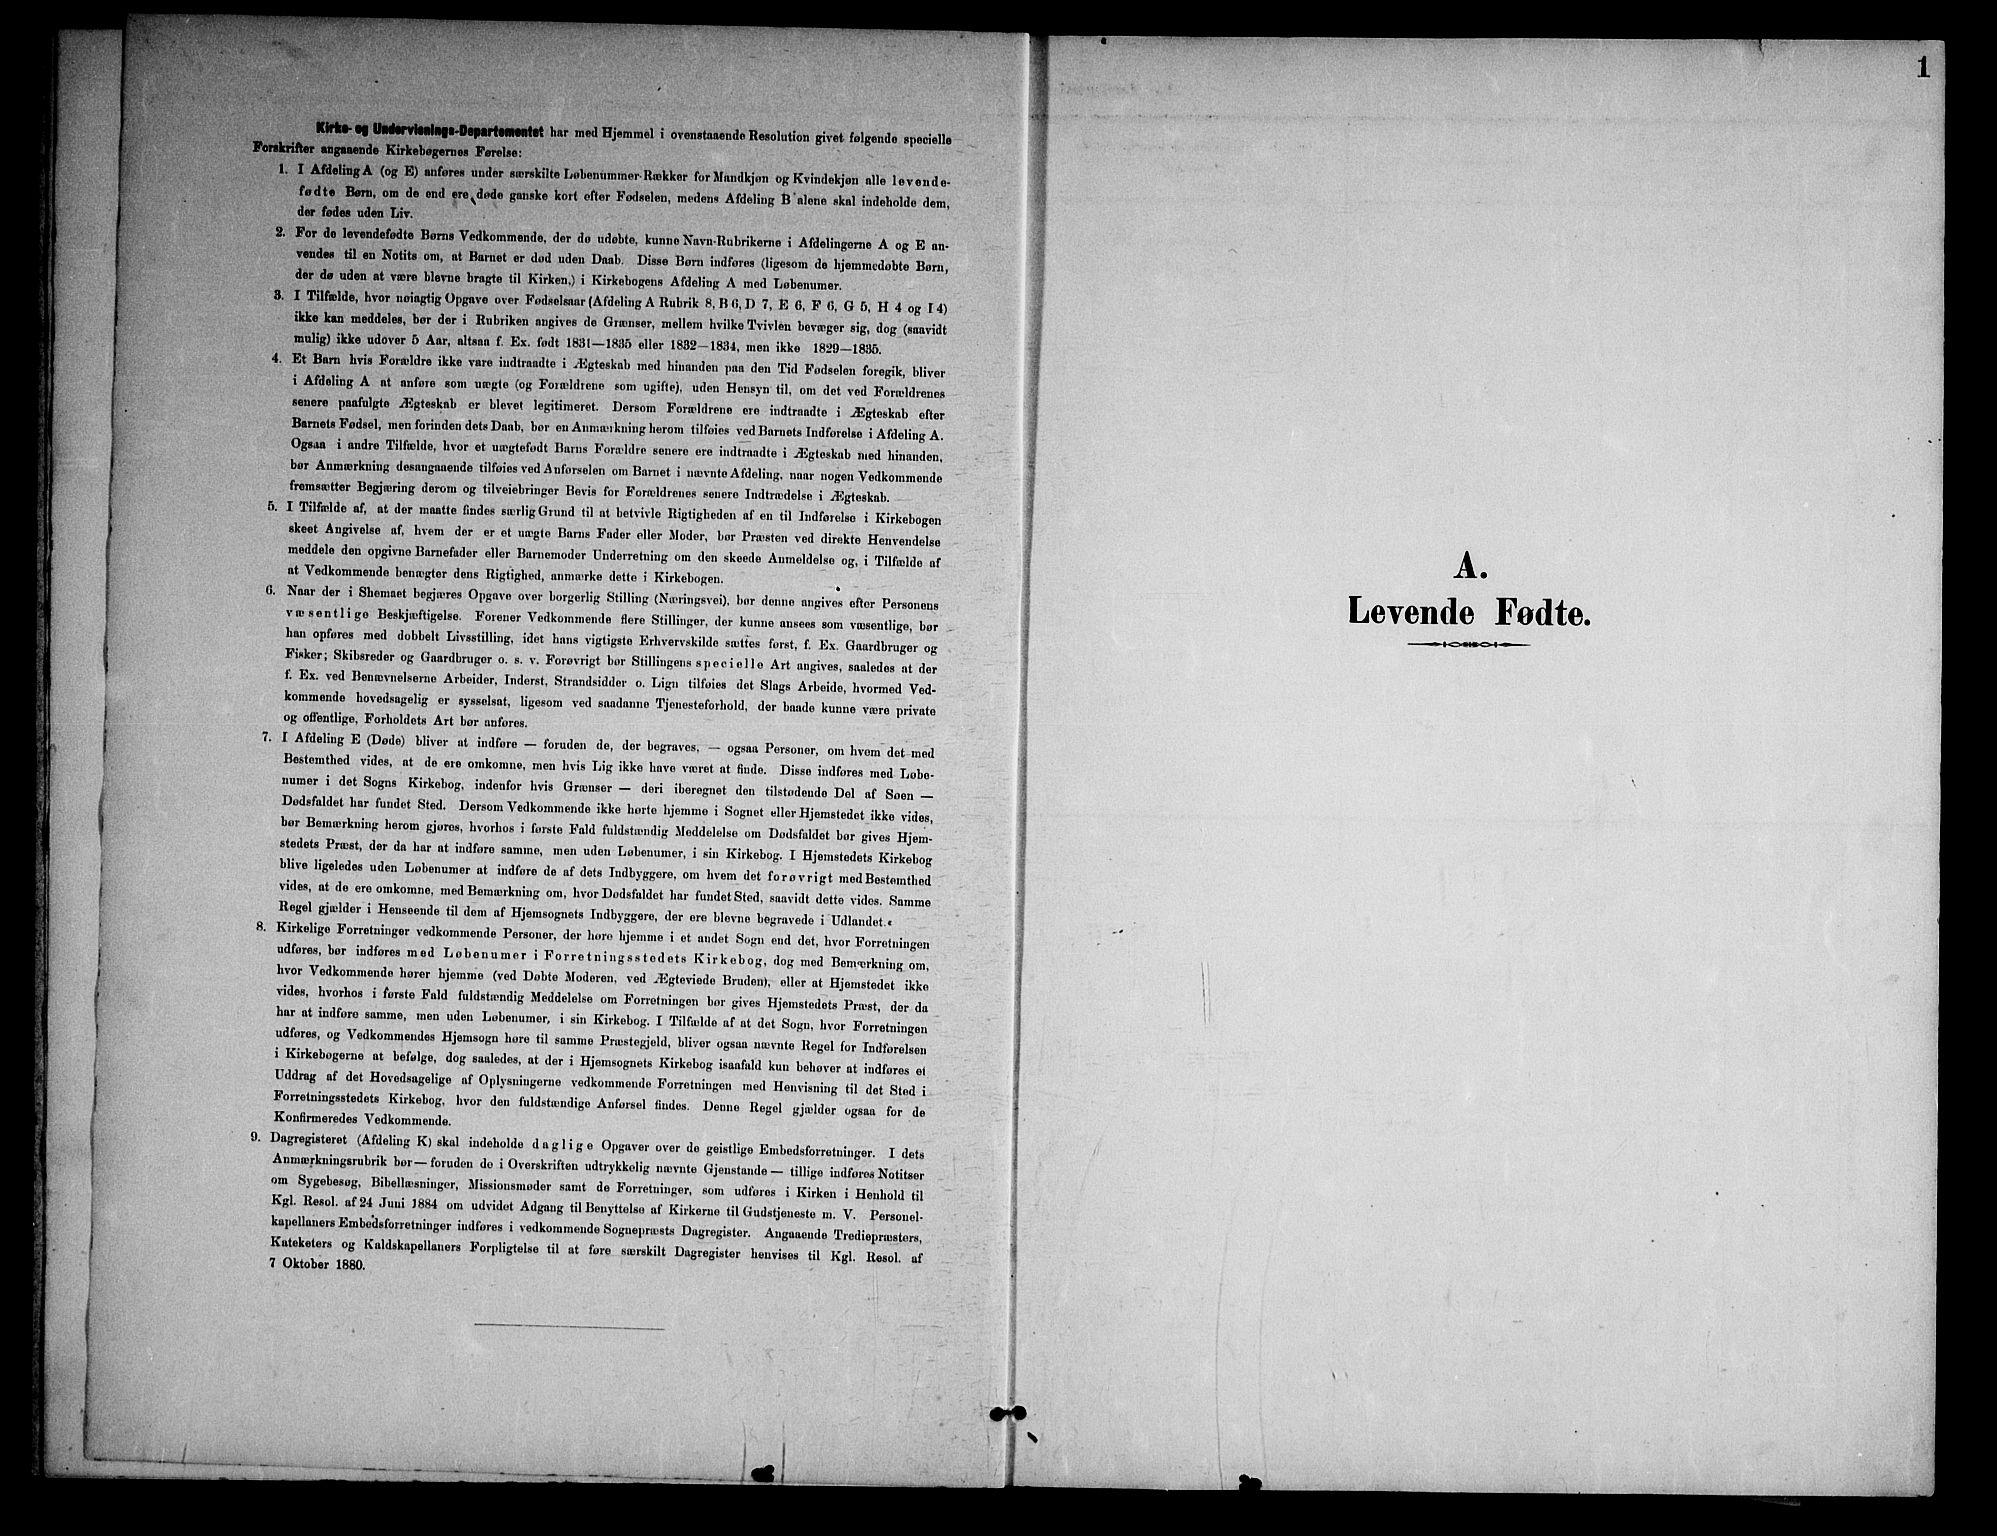 SAKO, Nissedal kirkebøker, G/Gb/L0003: Klokkerbok nr. II 3, 1893-1928, s. 1